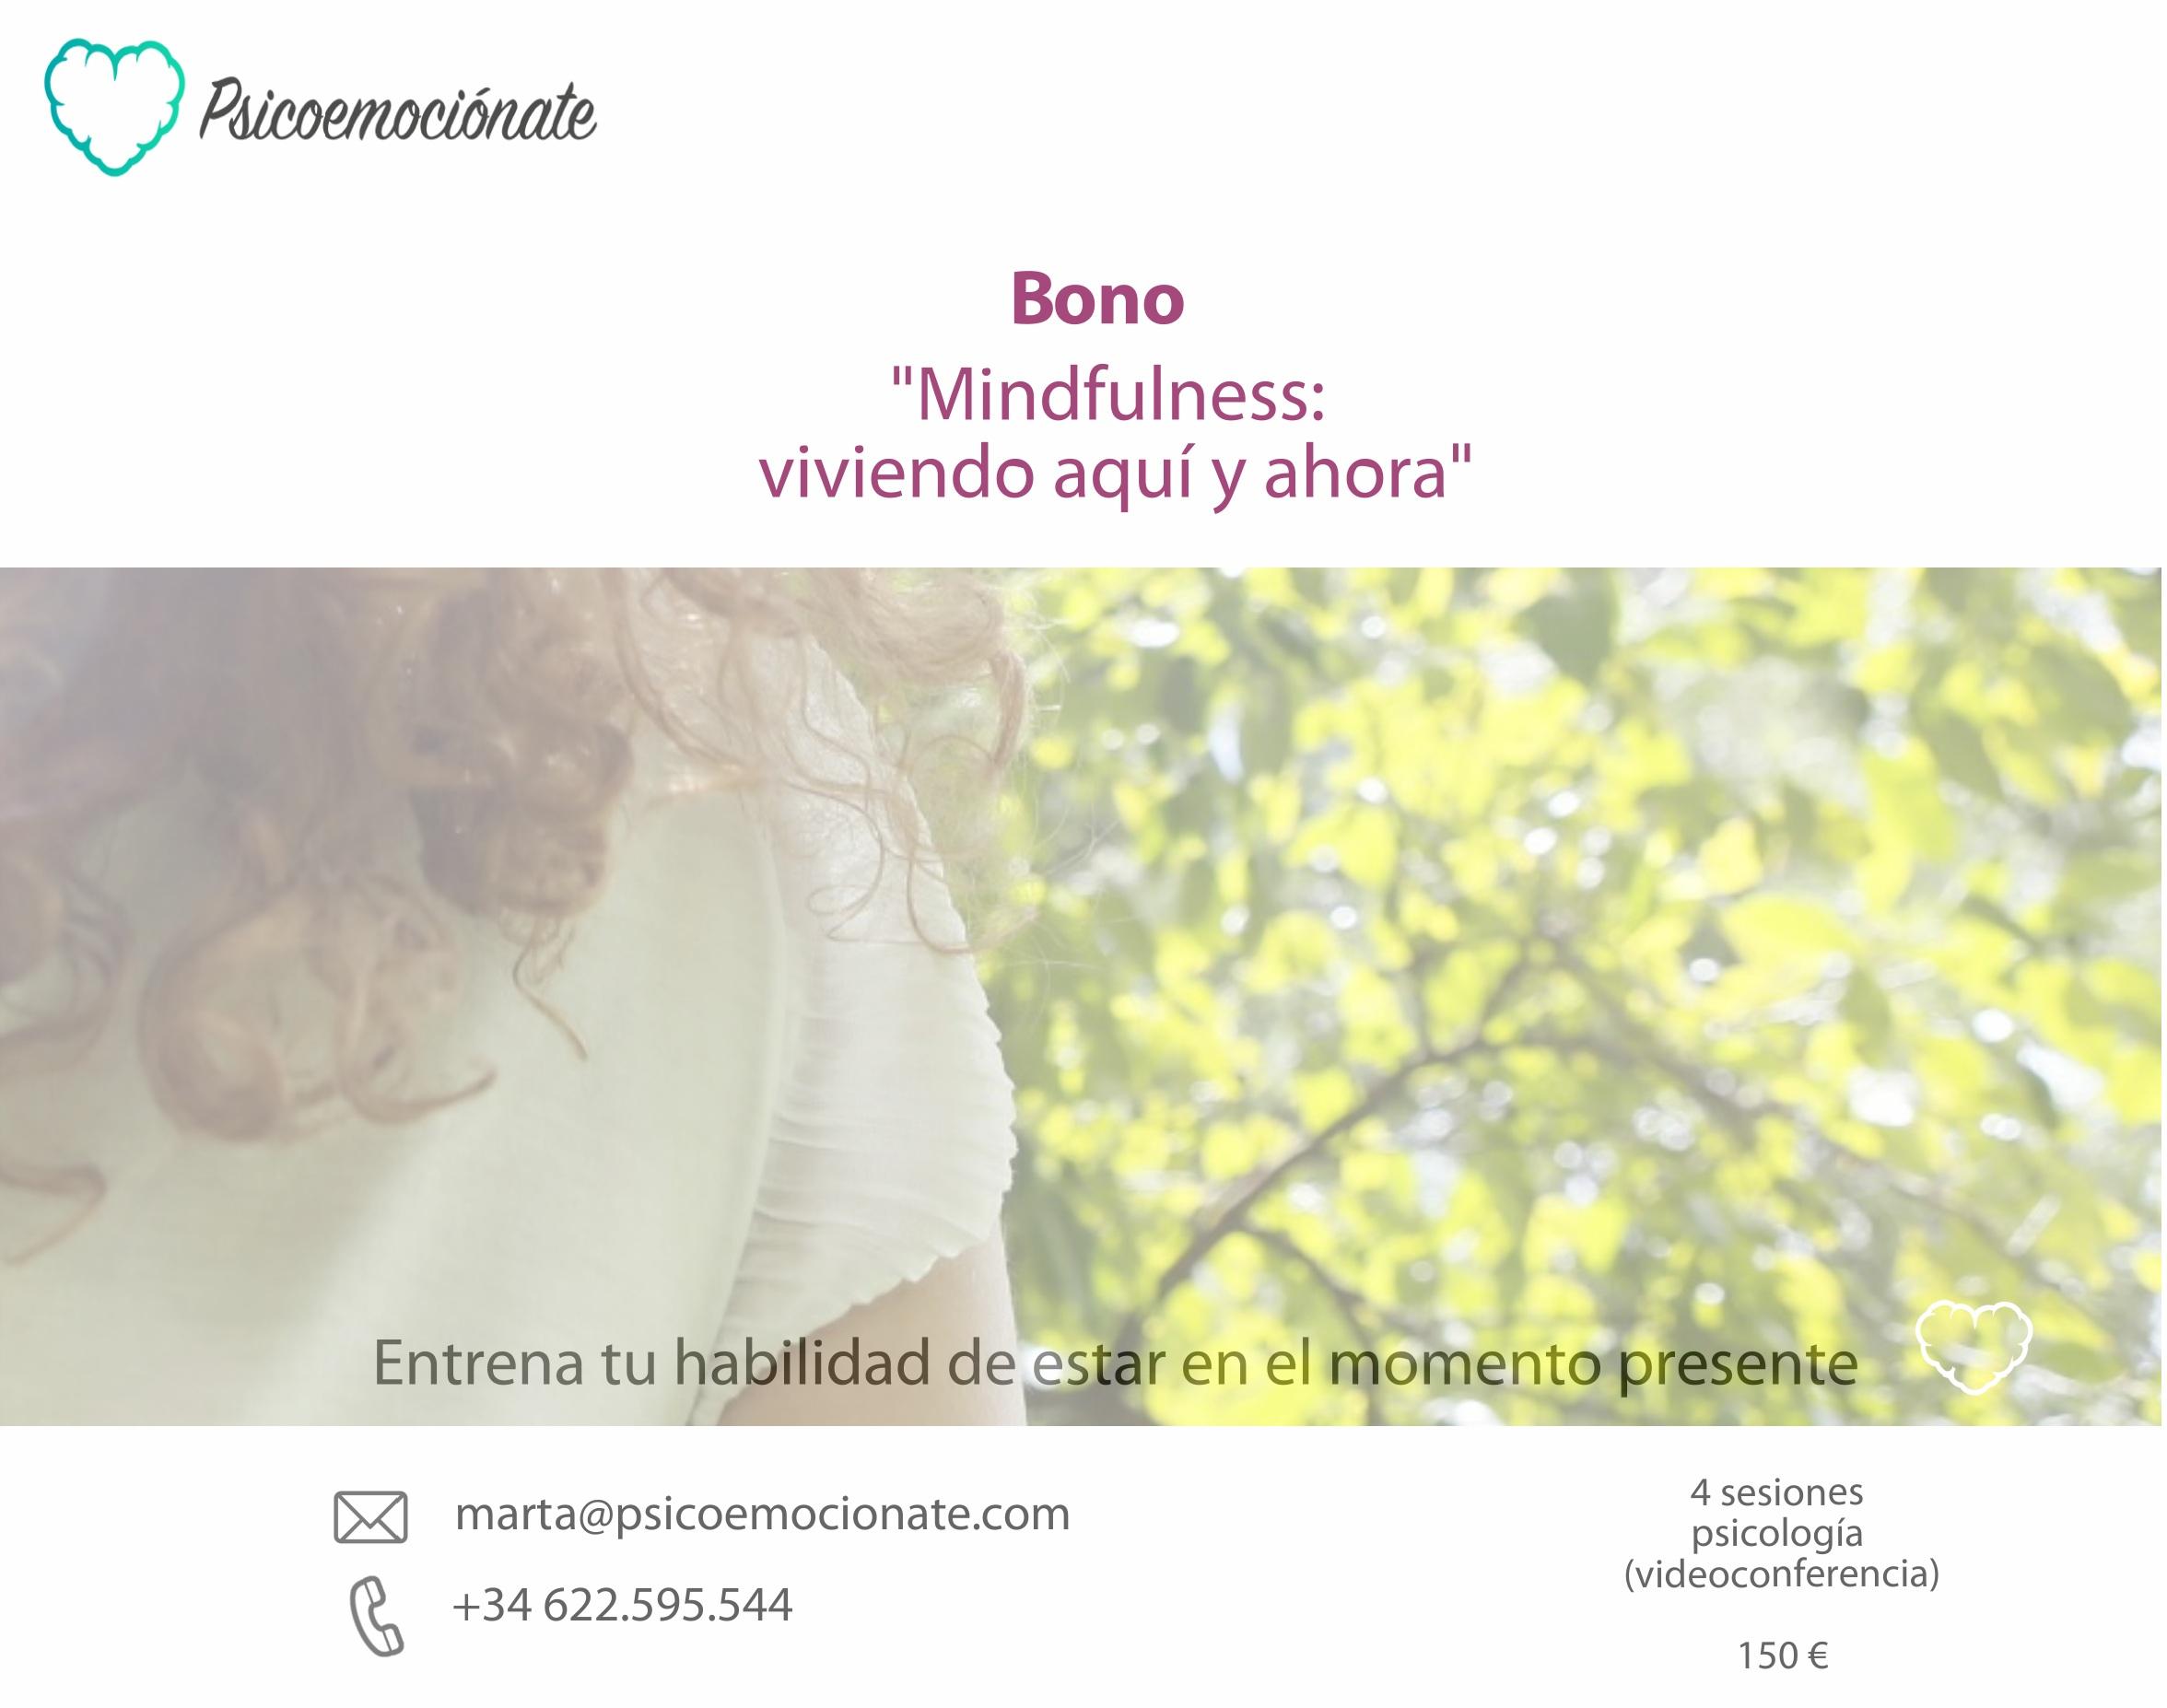 mindfulness psicologia online bonos